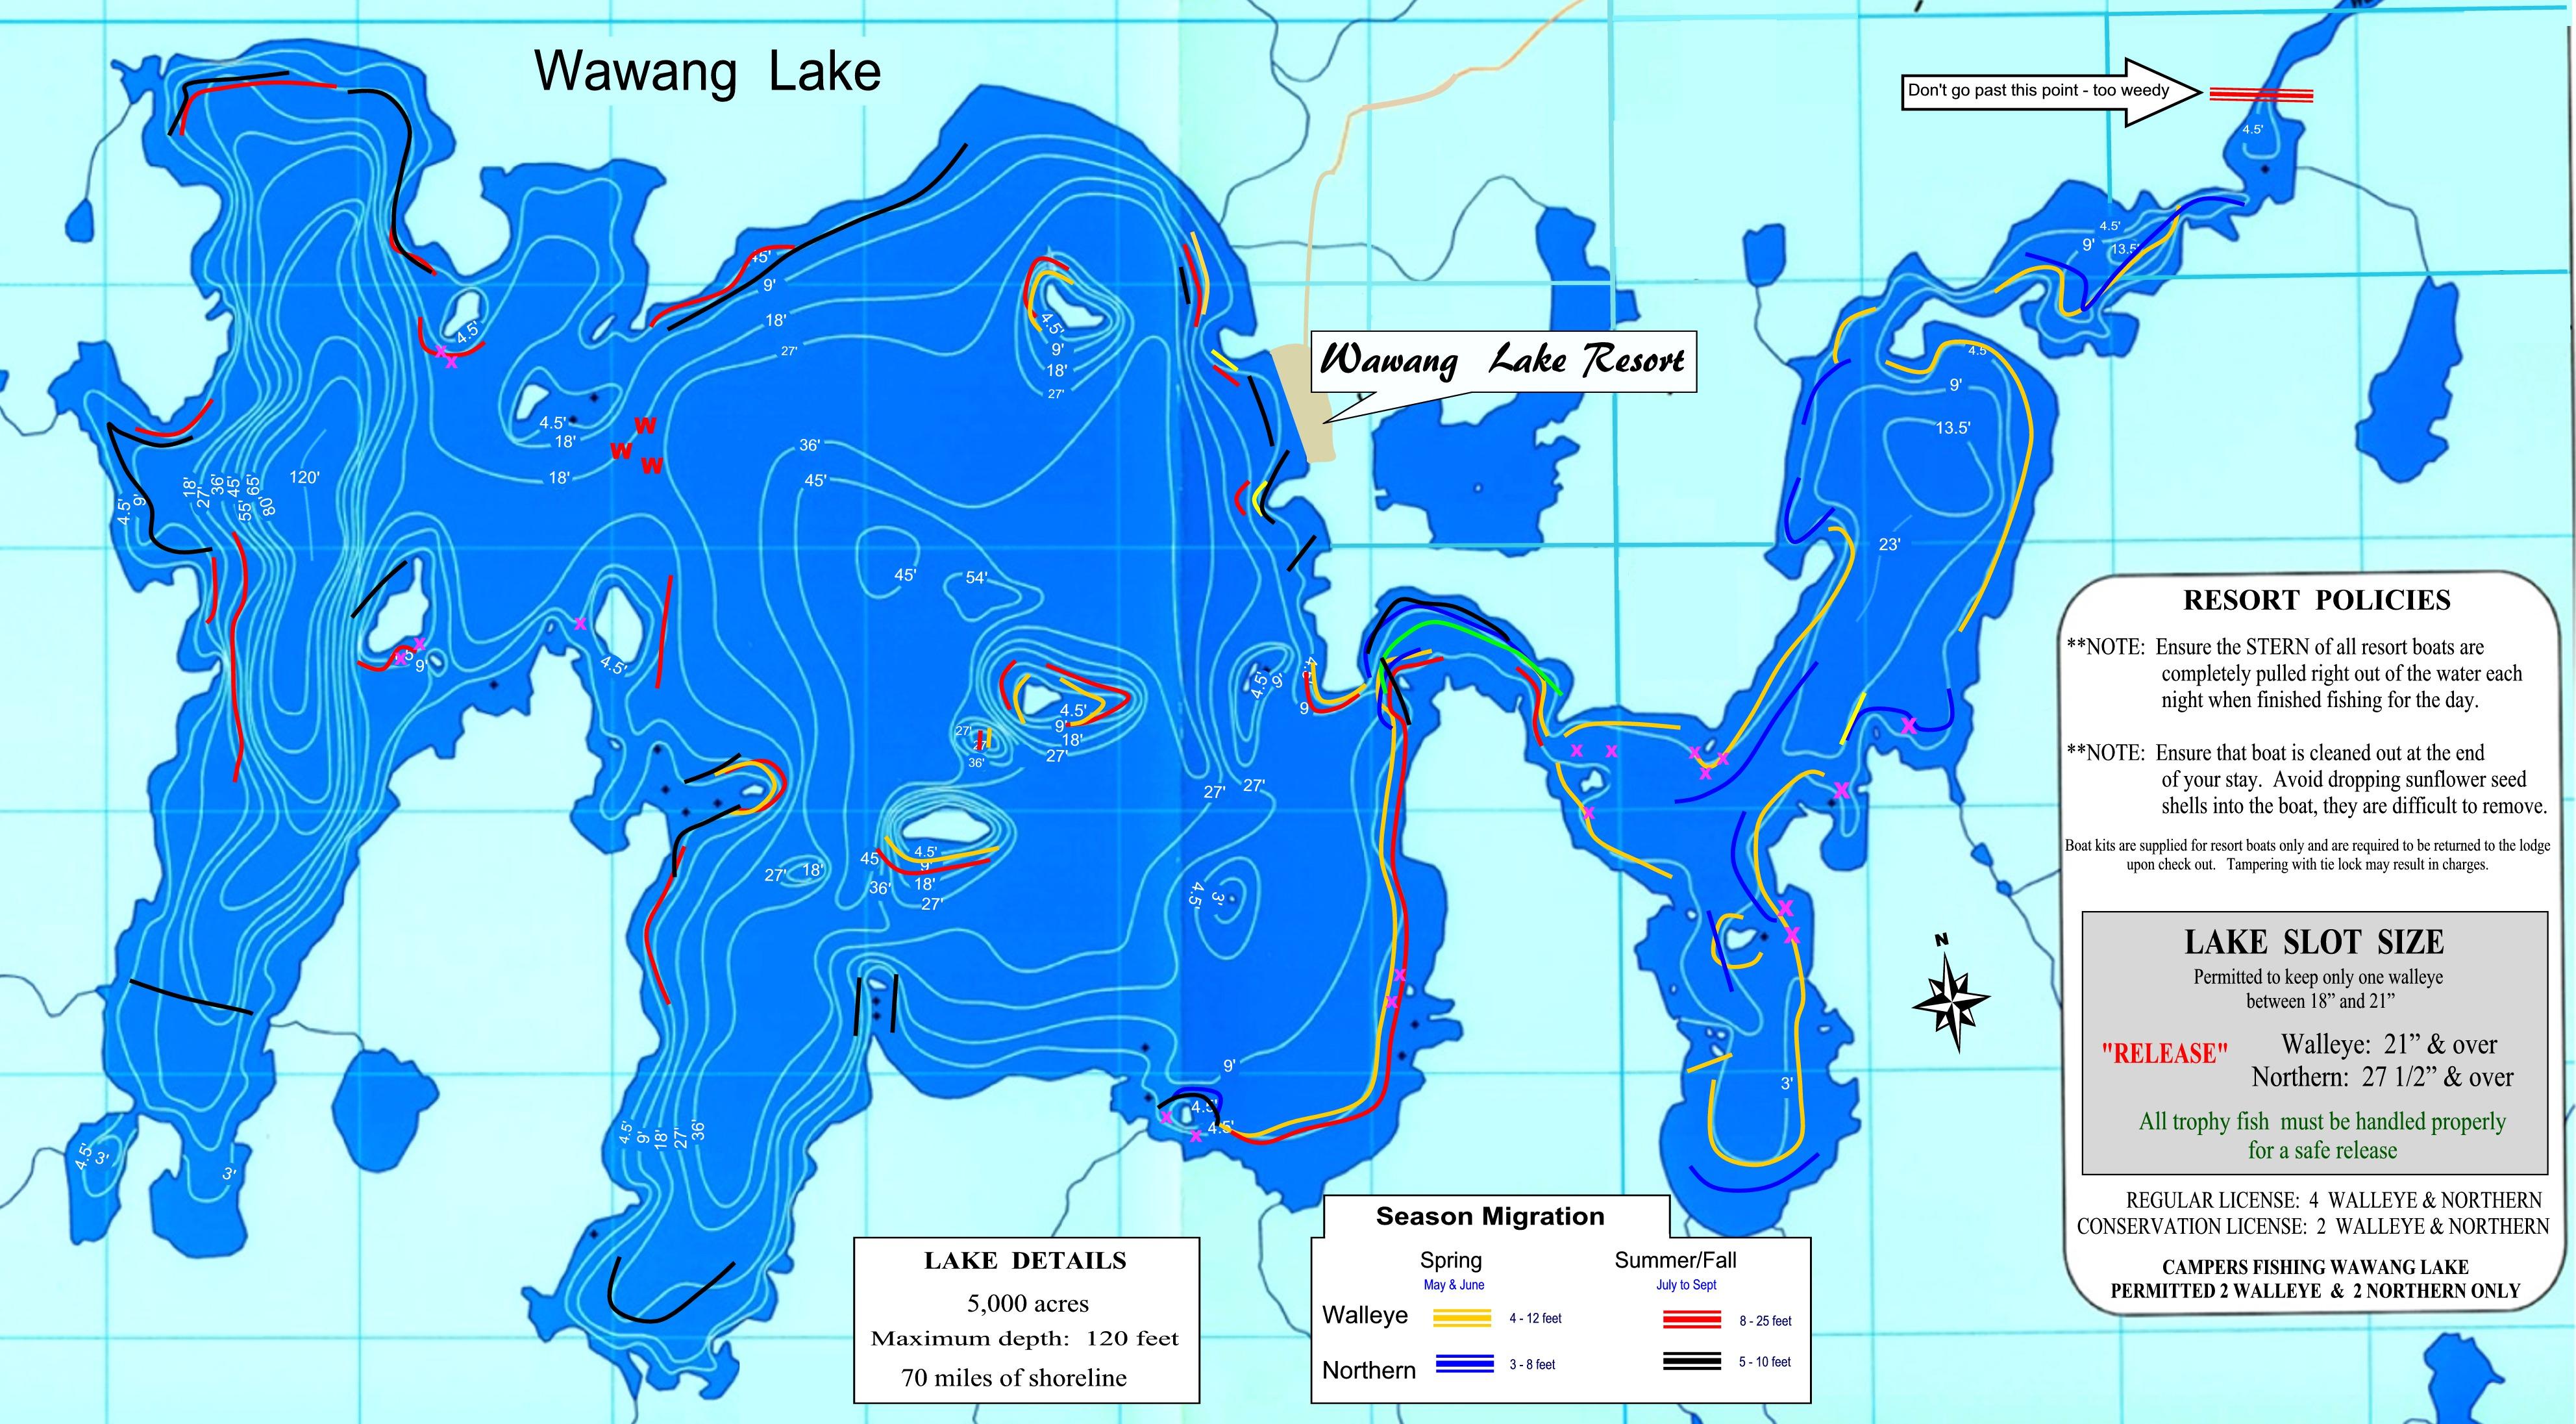 How to catch trophy walleye wawang lake resort new wawang lake map2 2 nvjuhfo Images